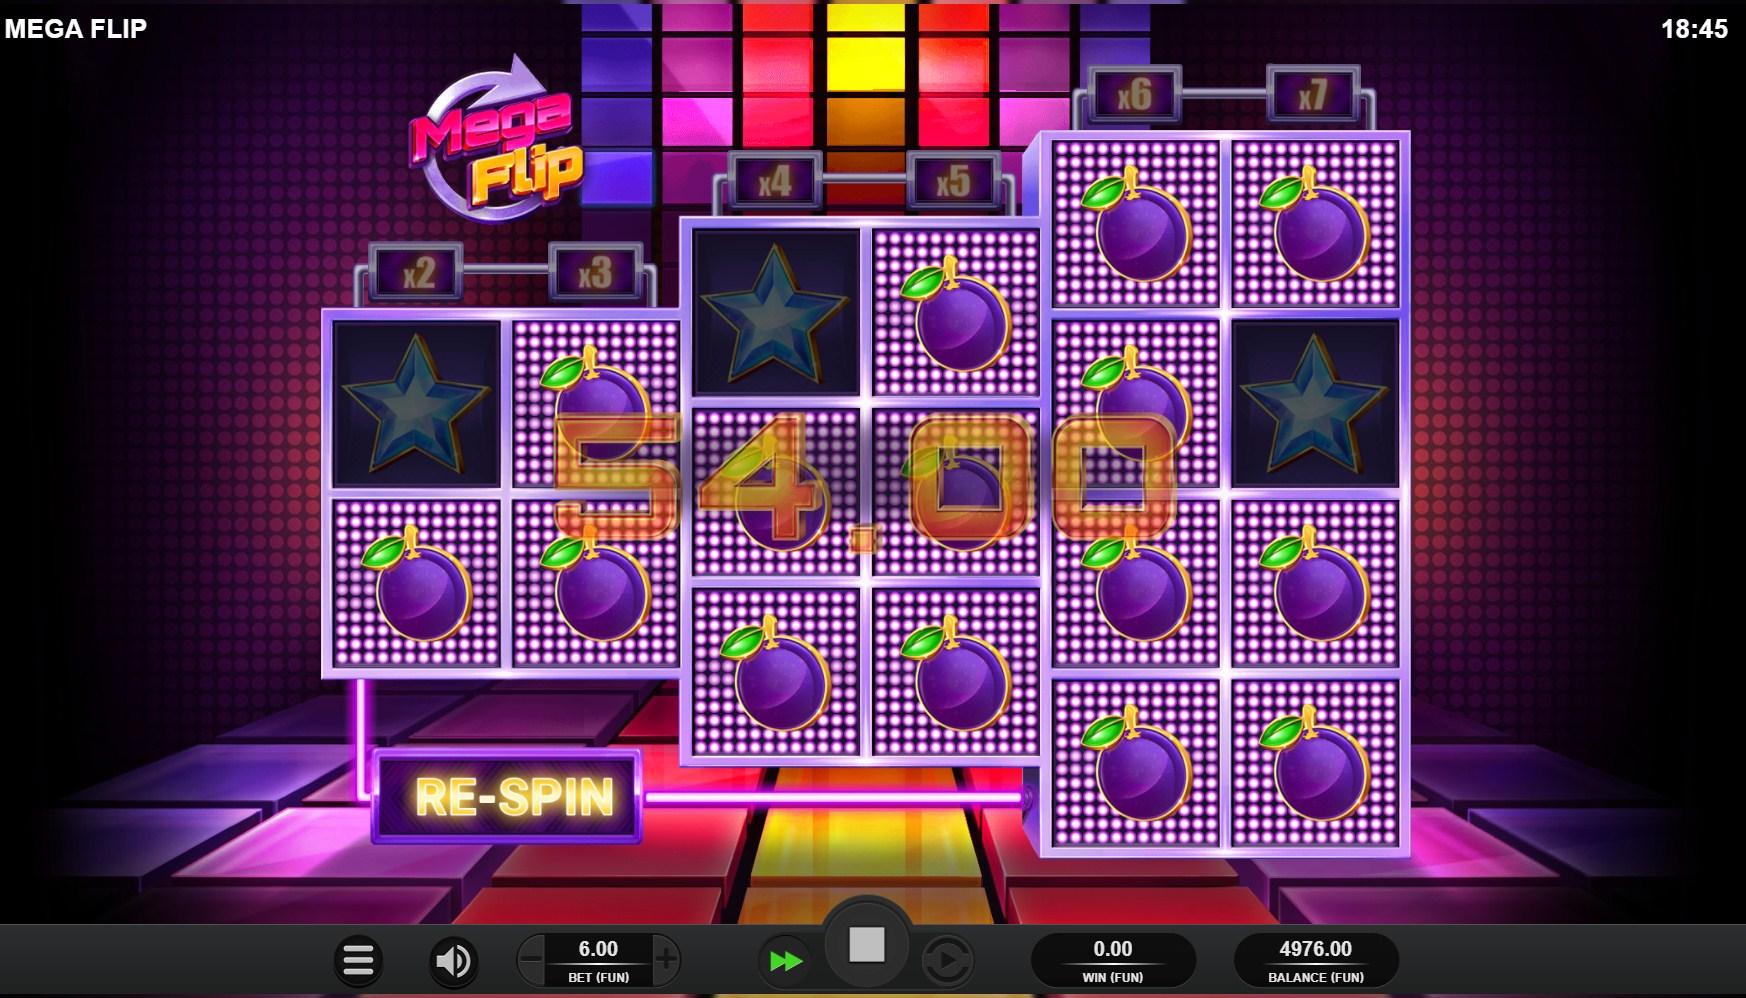 mega-flip-slot-gameplay